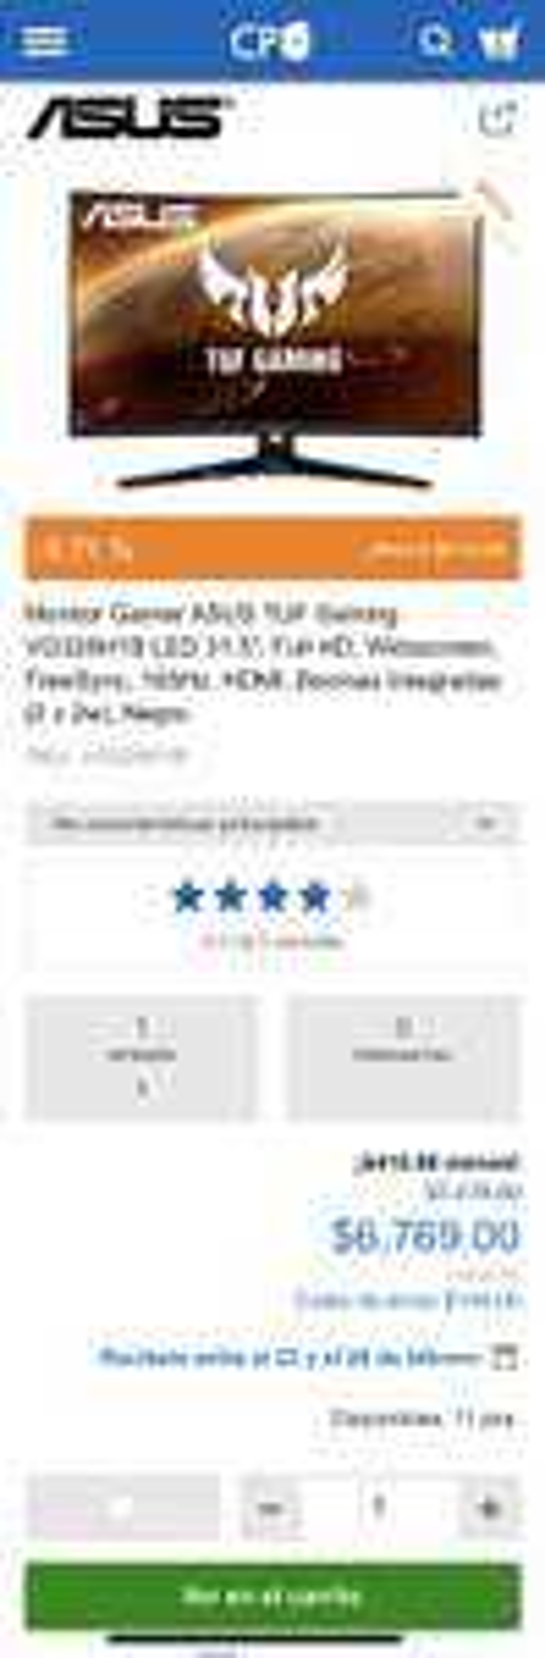 "CyberPuerta: Monitor Gamer ASUS TUF Gaming LED 31.5"", Full HD, Widescreen, FreeSync, 165Hz, HDMI, Bocinas Integradas (2 x 2w), Negro"